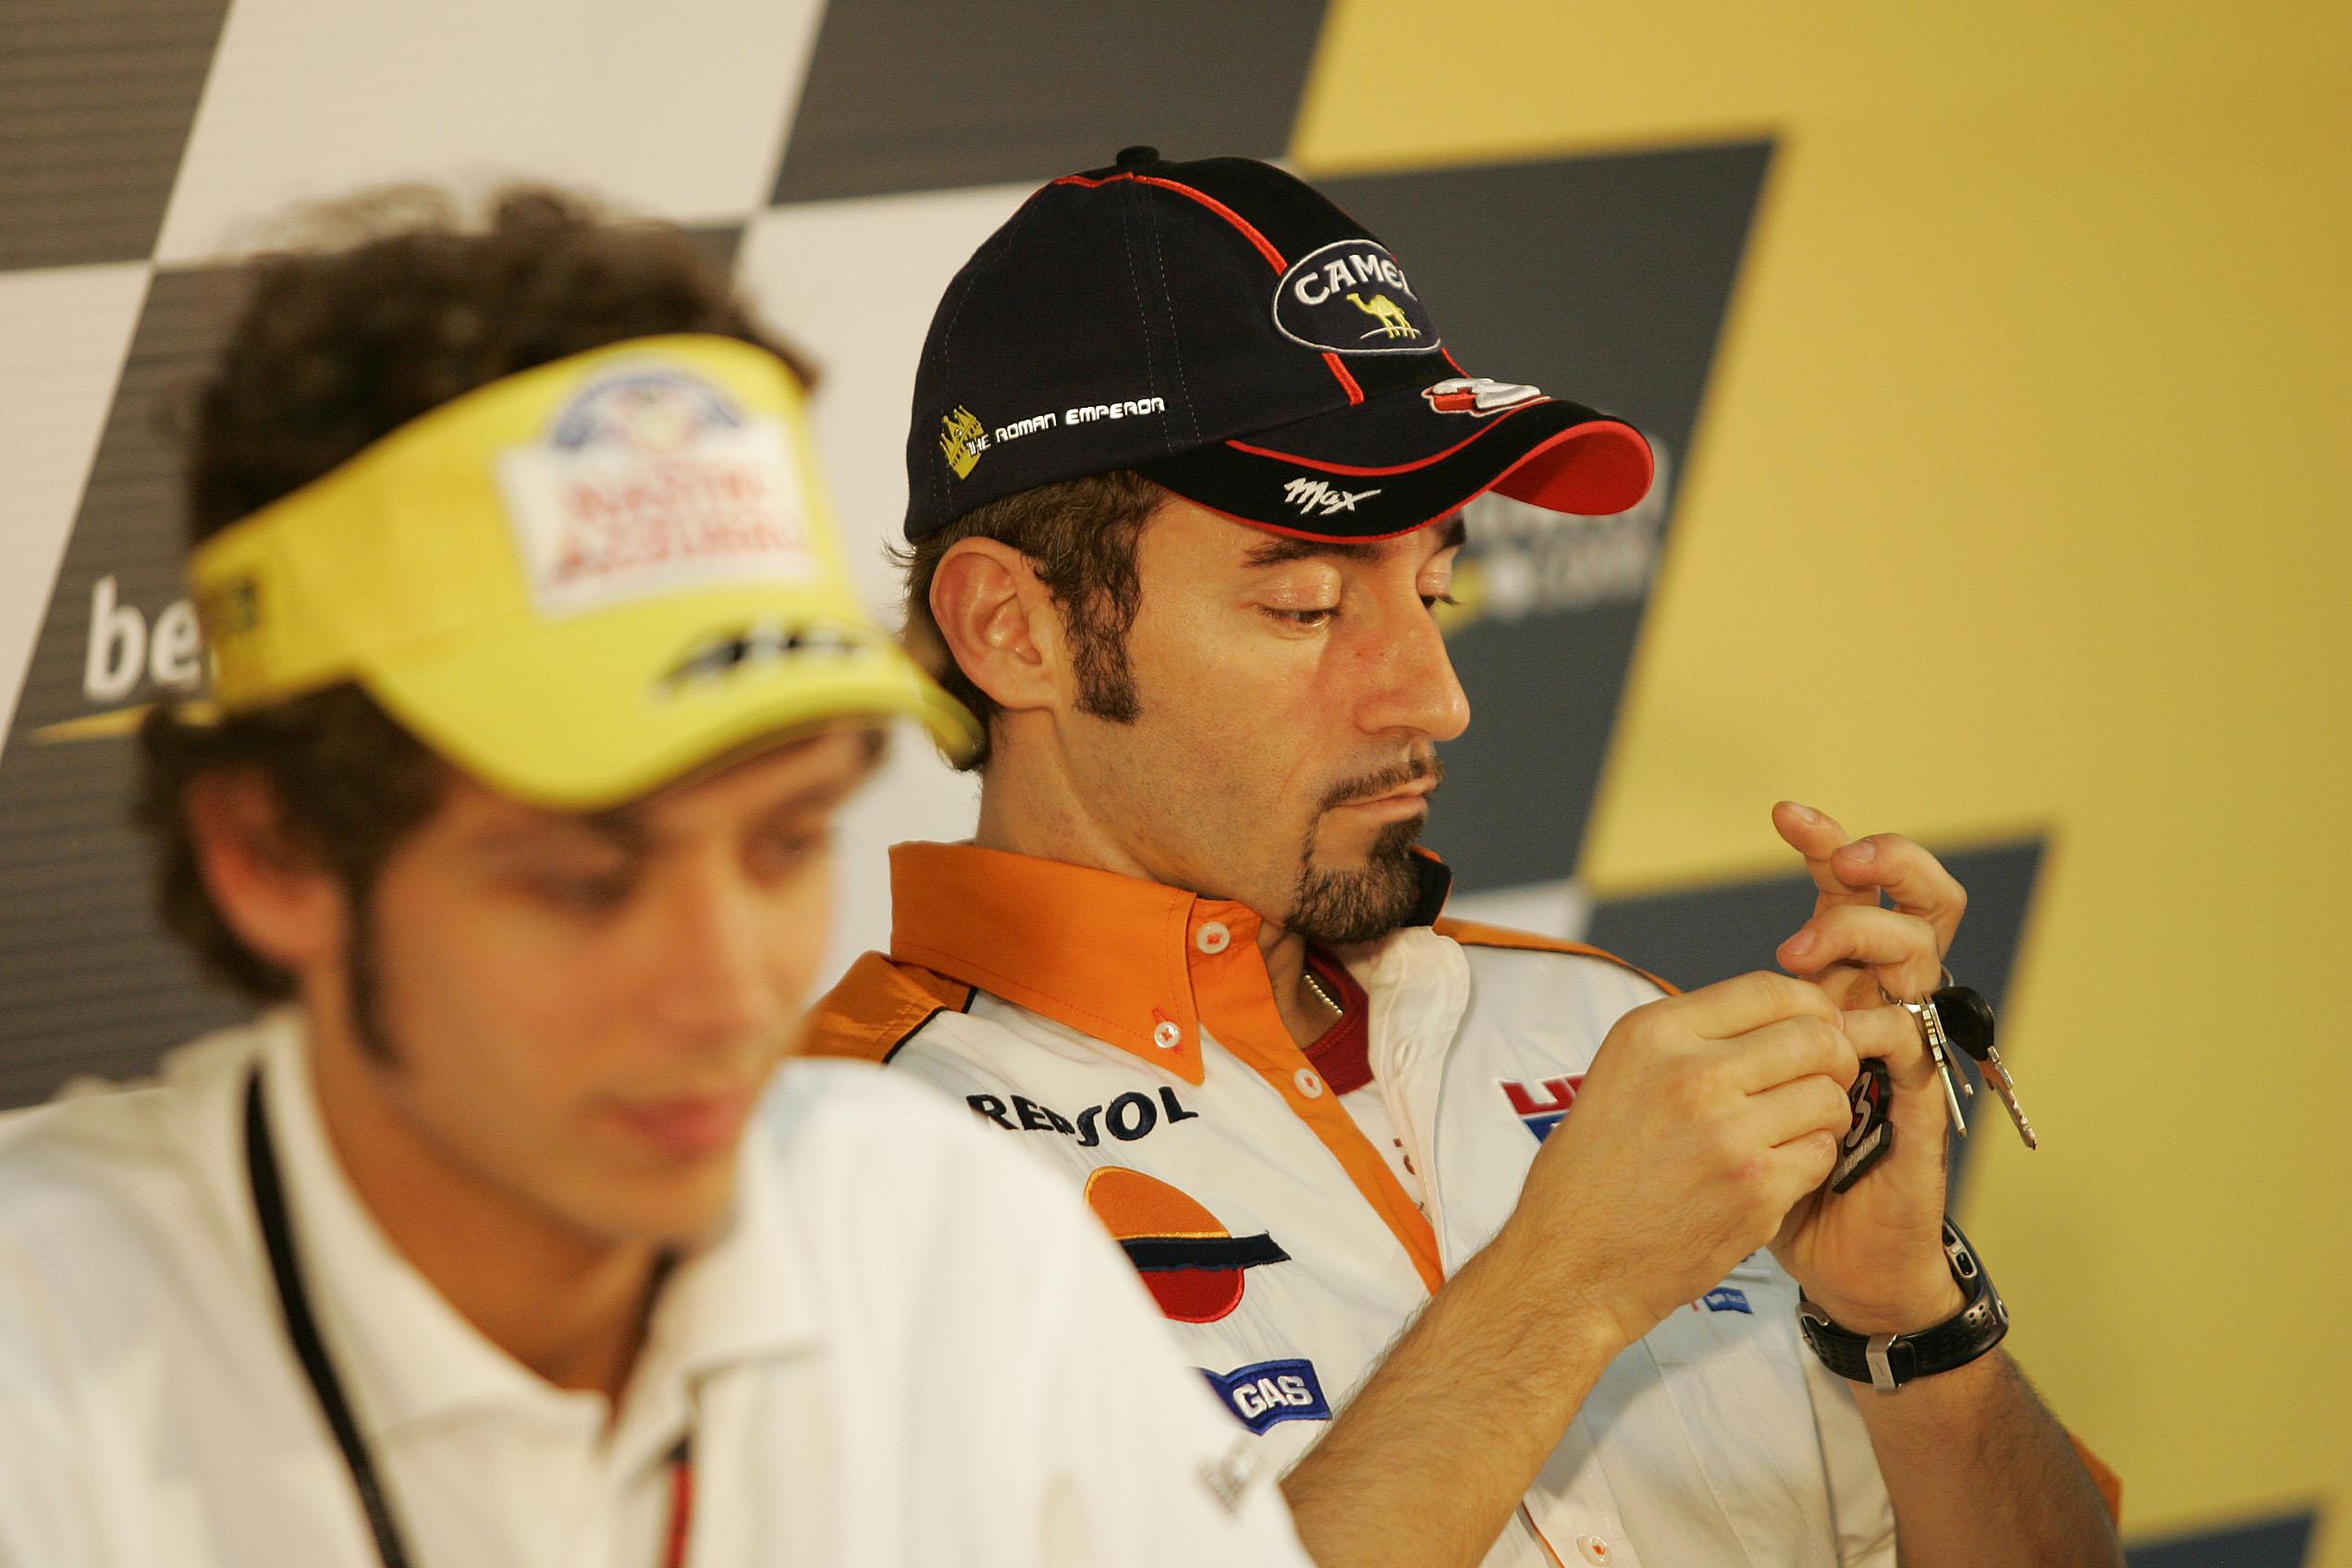 Biaggi: Rossi has no chance   Visordown